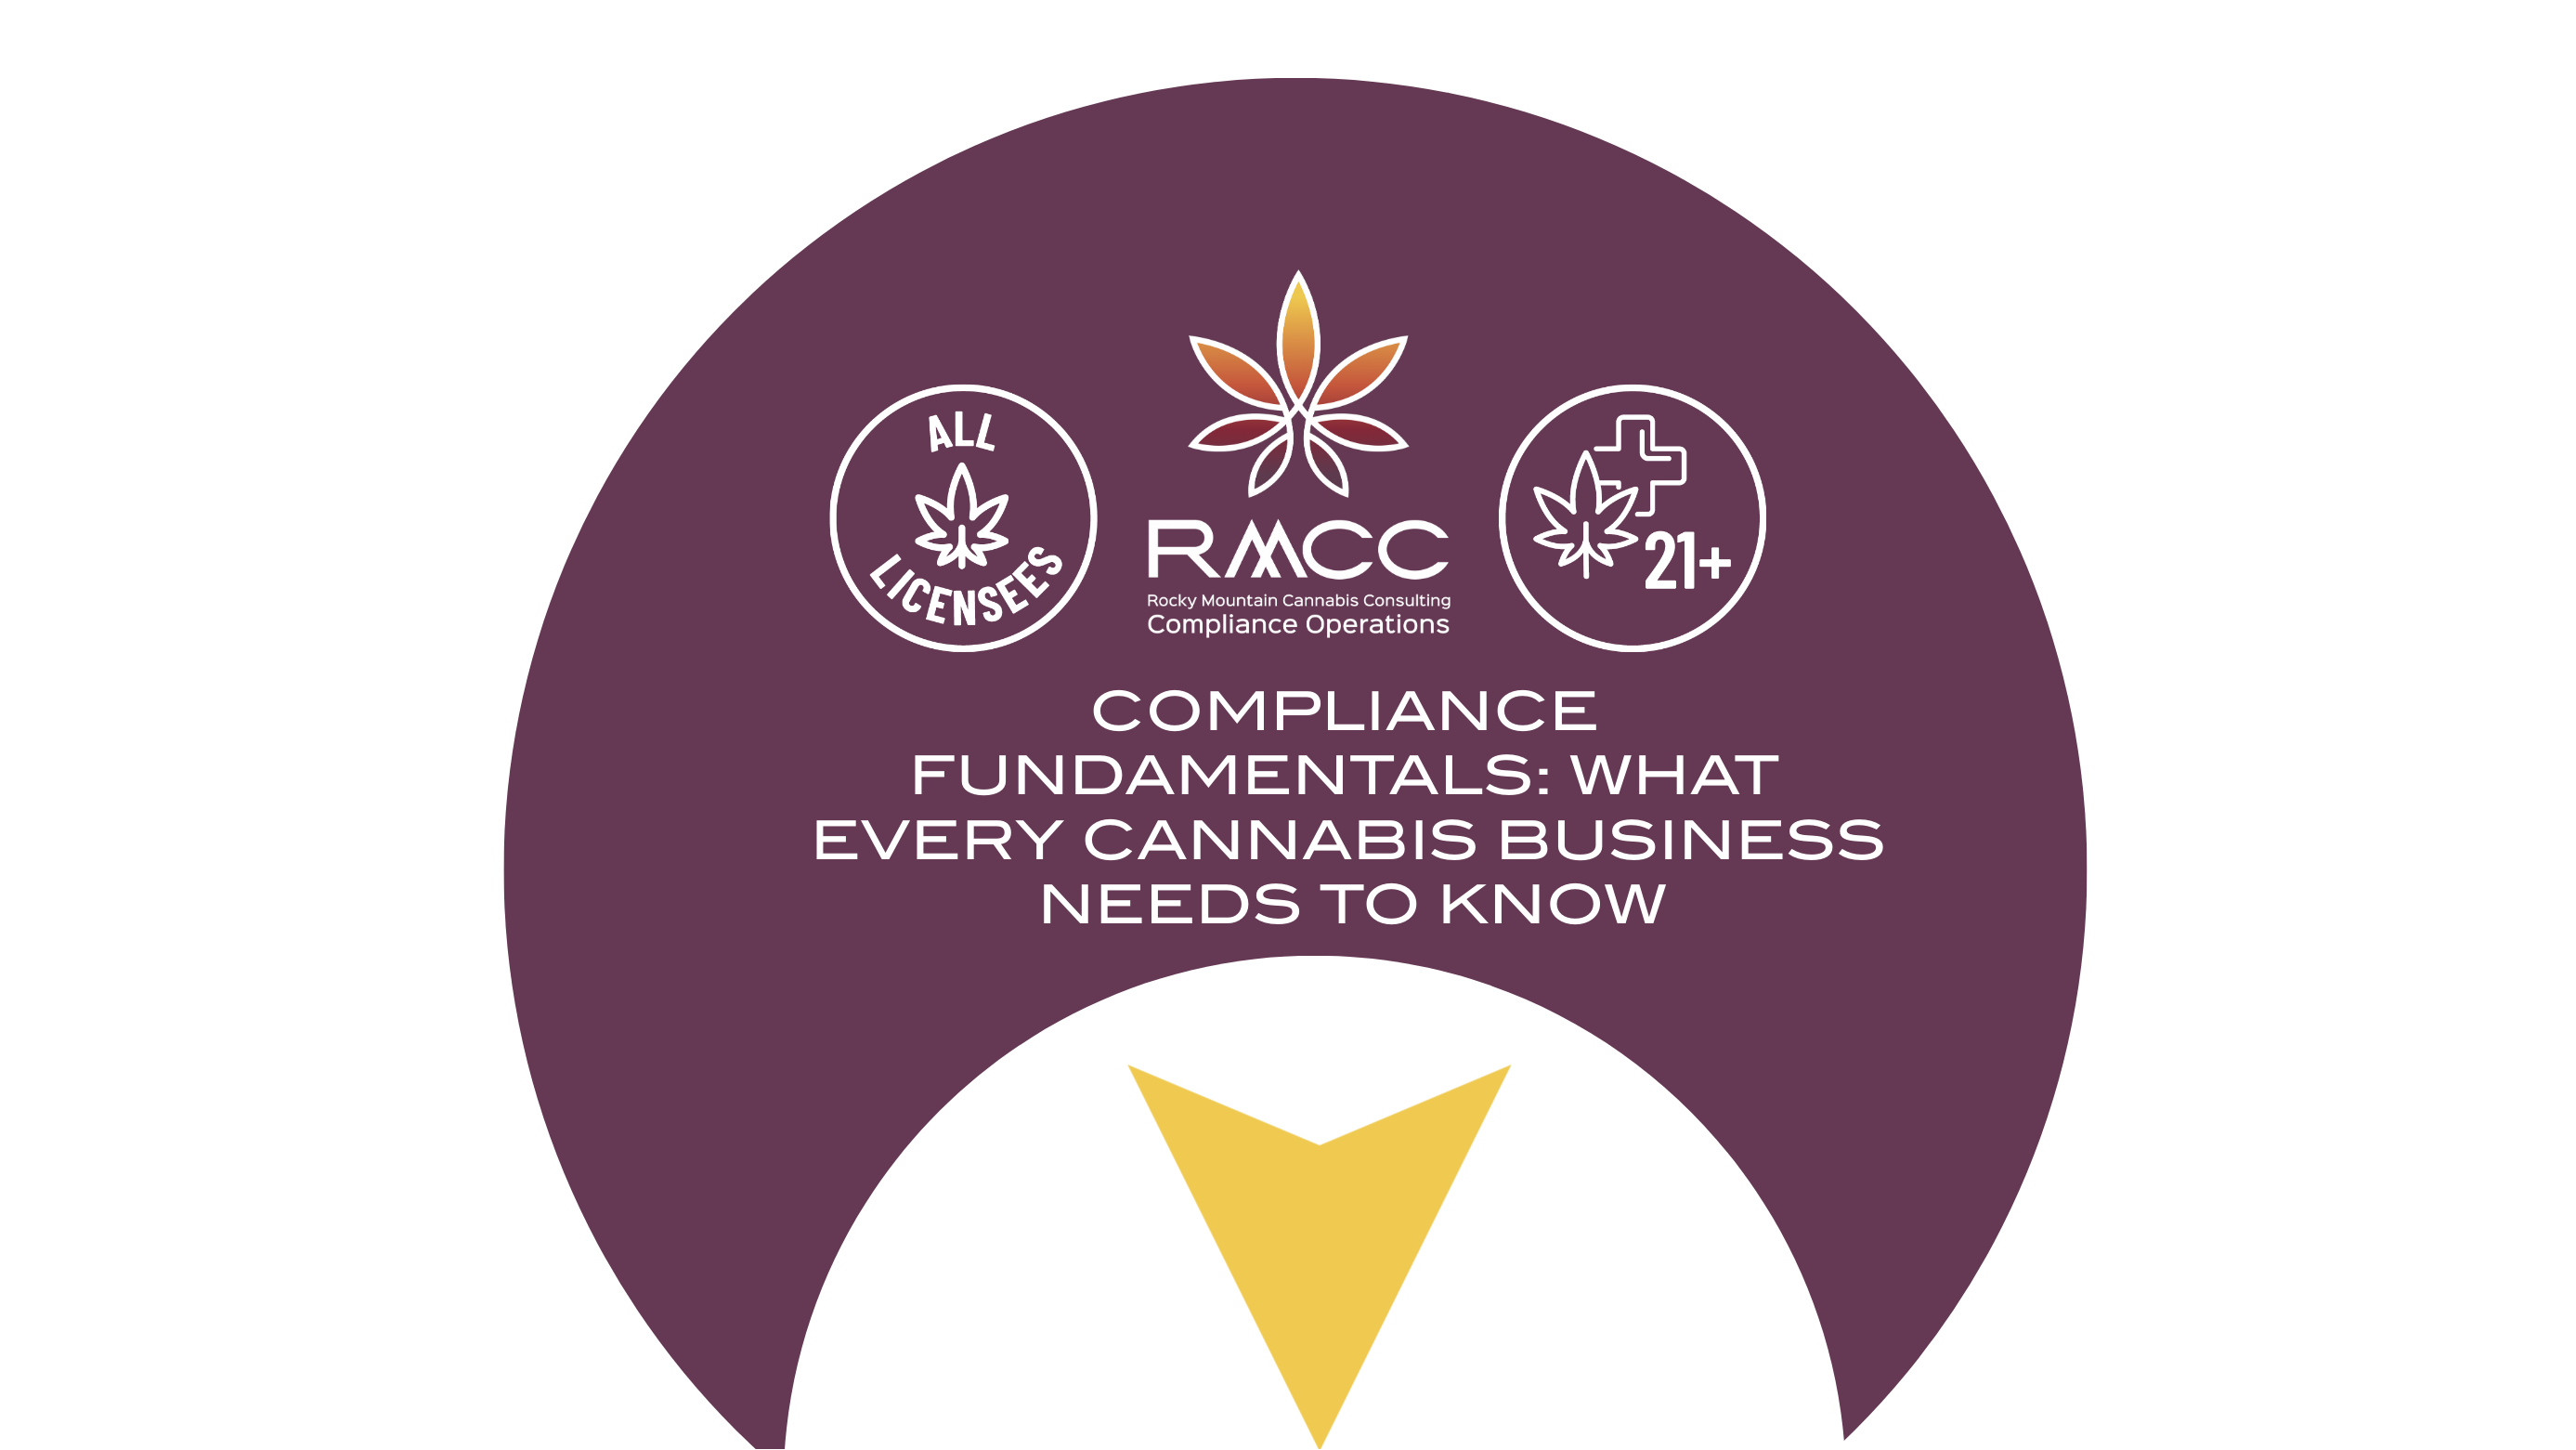 Sales Page Compliance Fundamentals: What Every Cannabis Business Needs to Know  RMCC METRC tickets, METRC training, Oklahoma cannabis, Maine Cannabis, Oregon Cannabis, coronavirus, cannabis certification